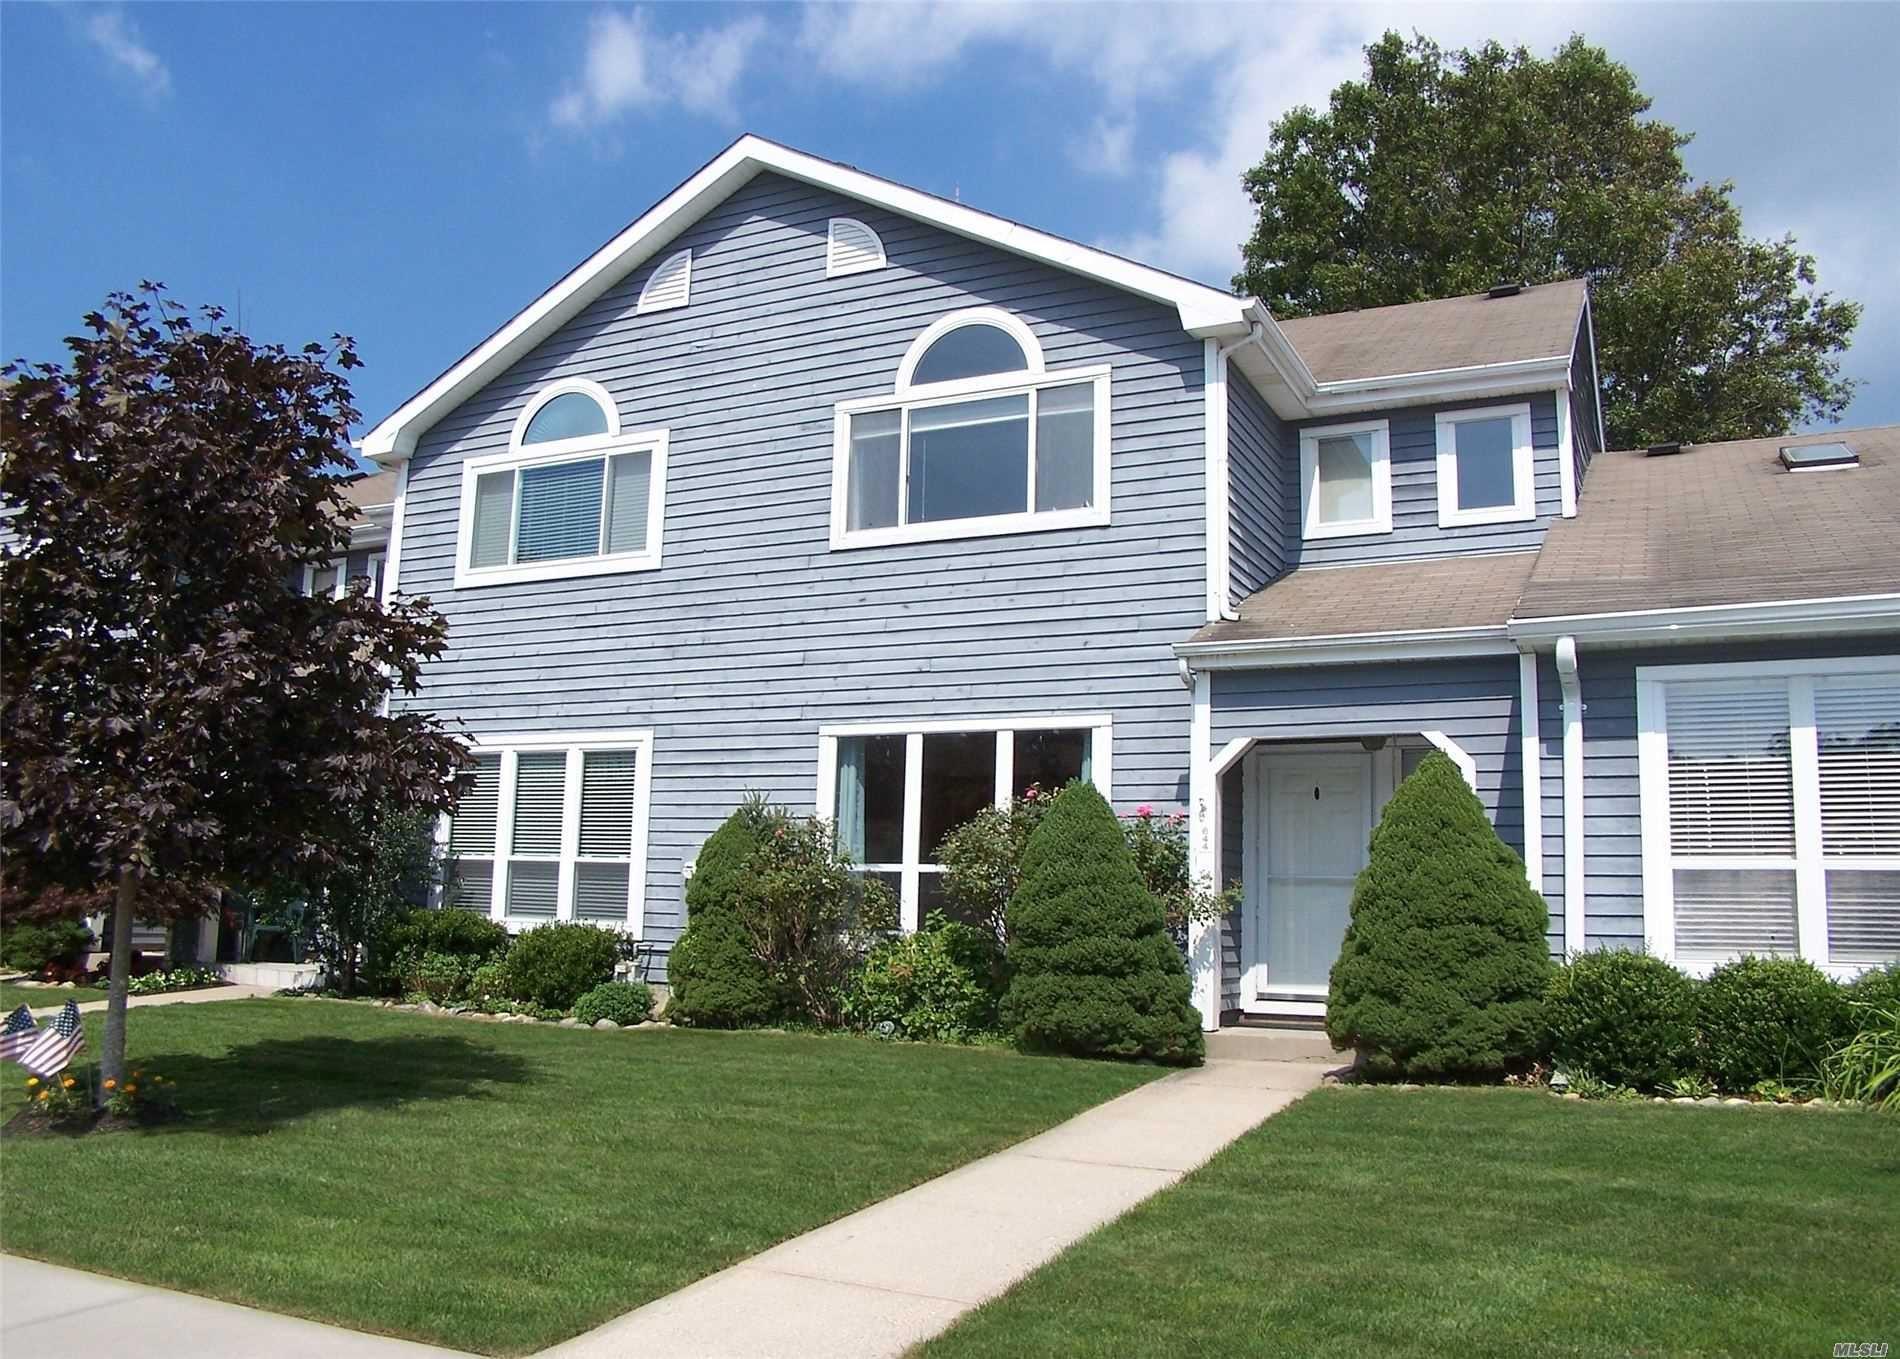 644 Birchwood Park Drive, Middle Island, NY 11953 - MLS#: 3240042